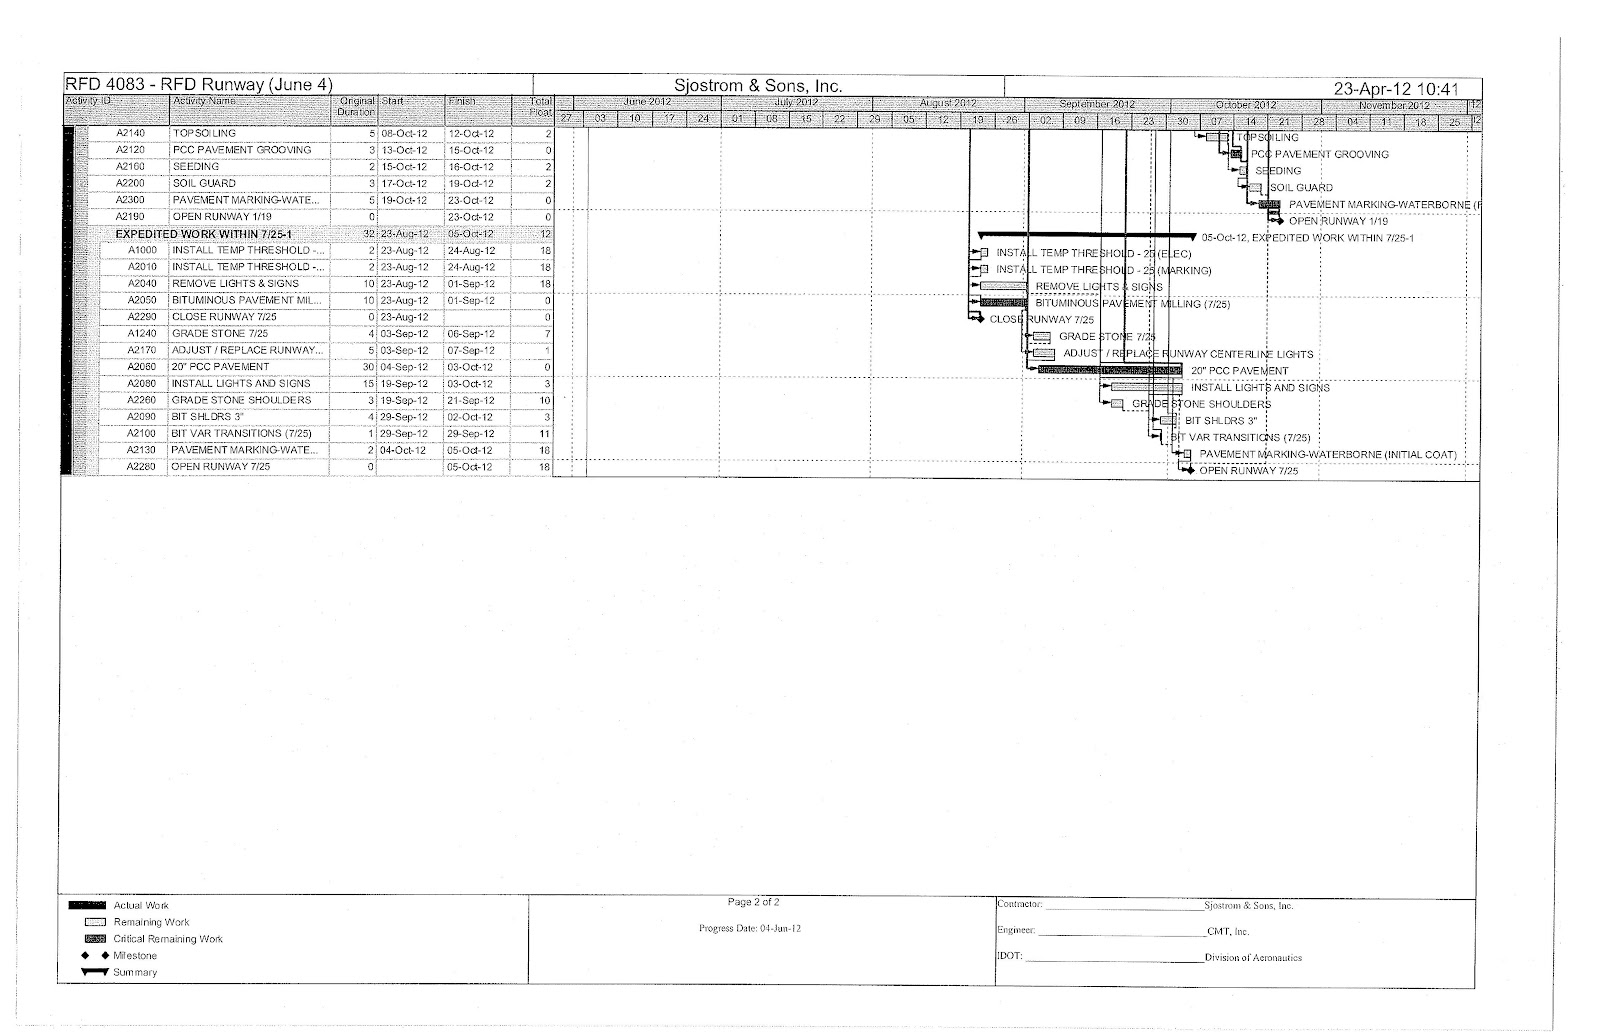 RFD Runway 1/19 and Terminal Parking Construction Progress ...